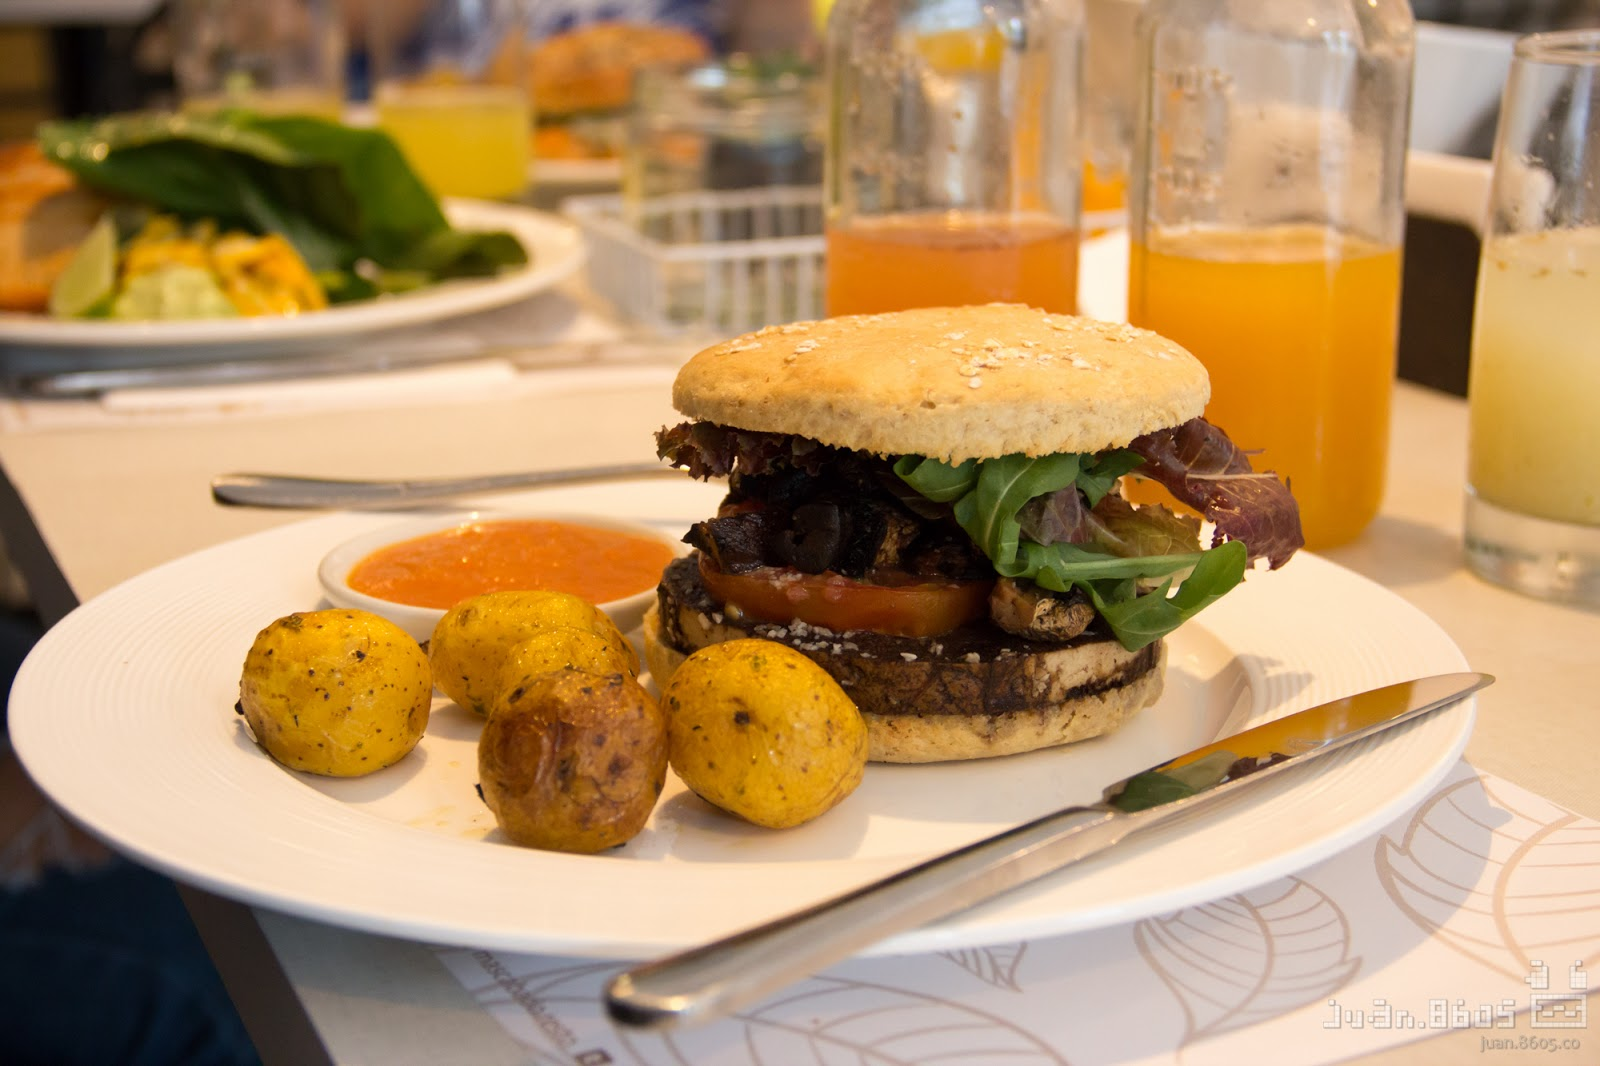 mascabado, restaurante granada cali, cocina artesanal, cali colombia, casa de te, comida vegana